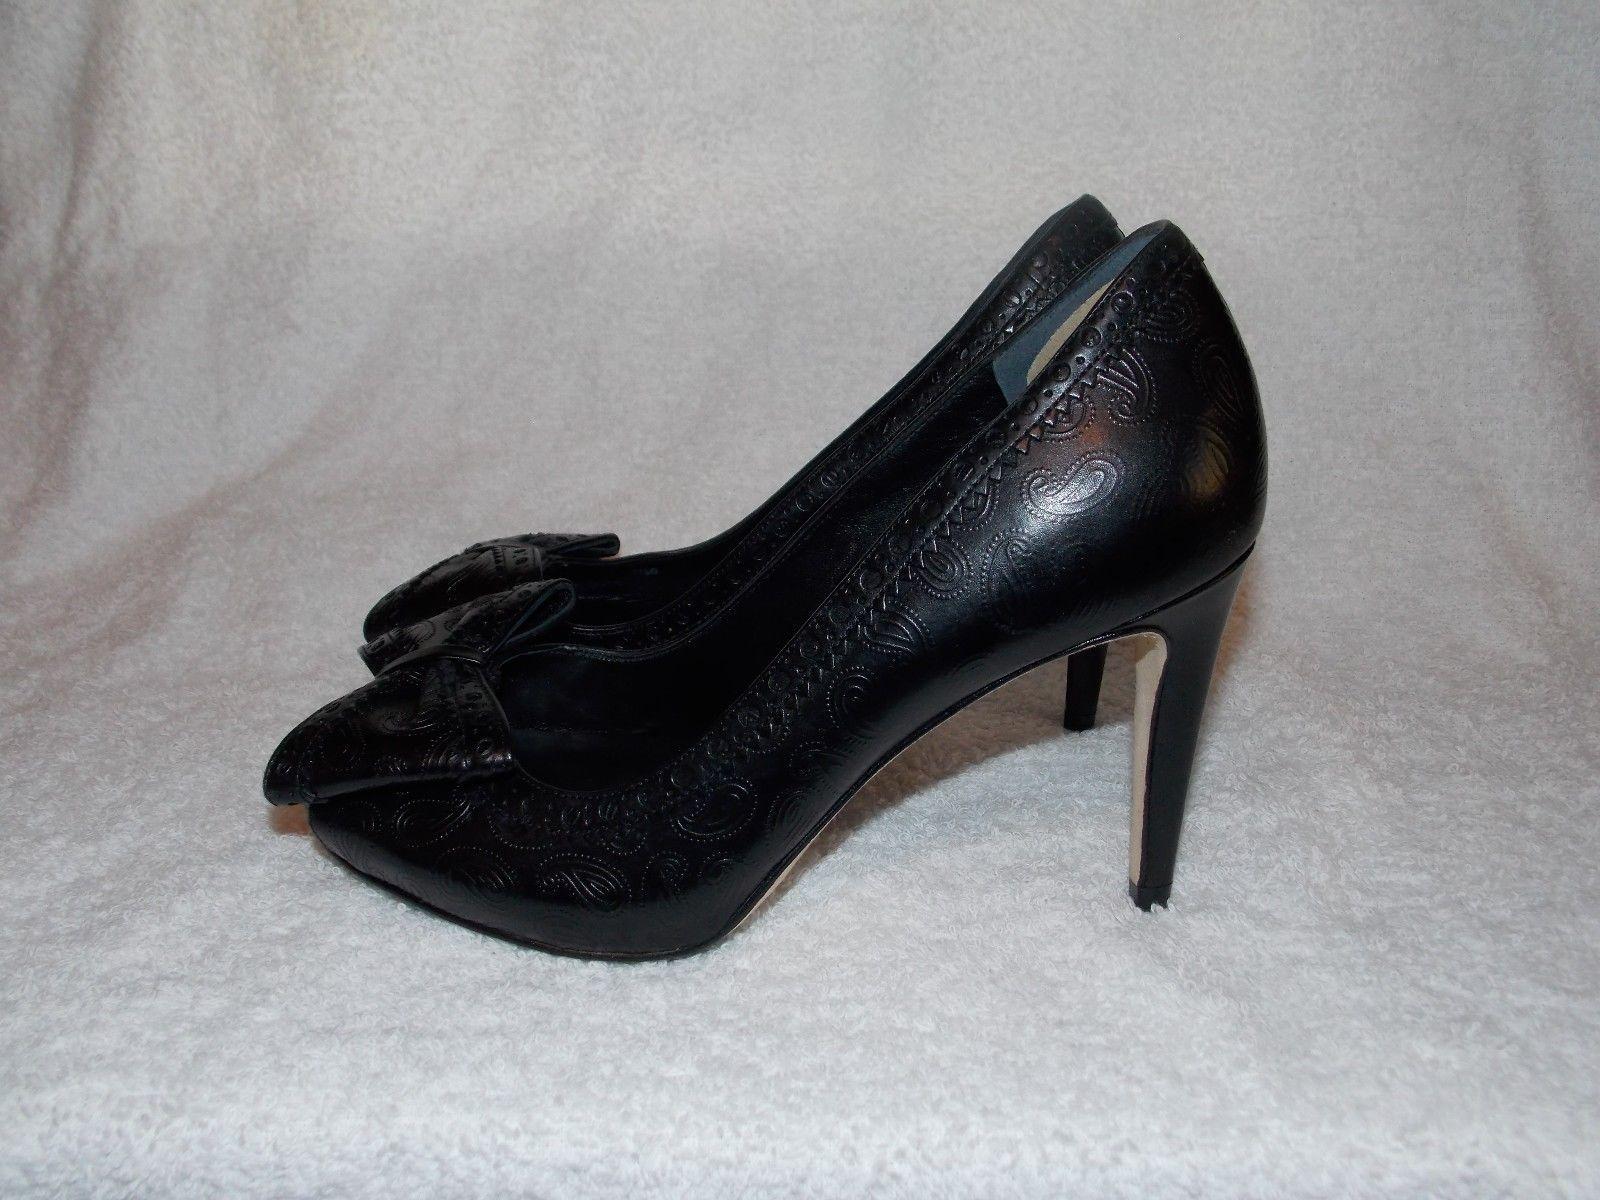 d00c5ad3a918e Cole Haan Violet Air Ot Bow Black Peep Toe and similar items. S l1600